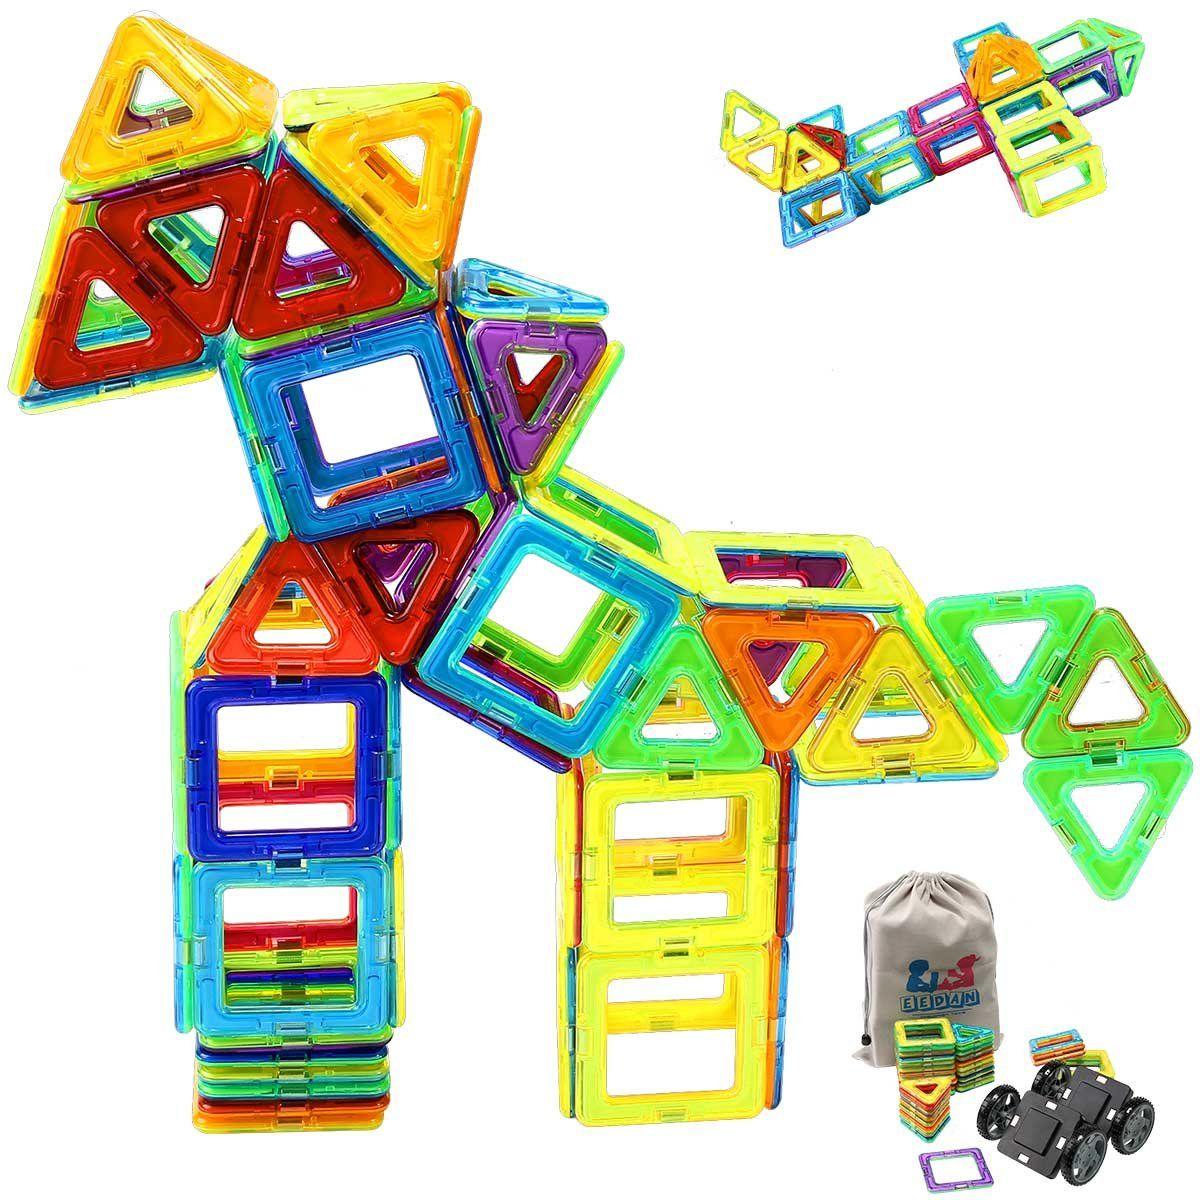 Magnetic Blocks Tiles Building Set For Kids Magnet Creativity Educational